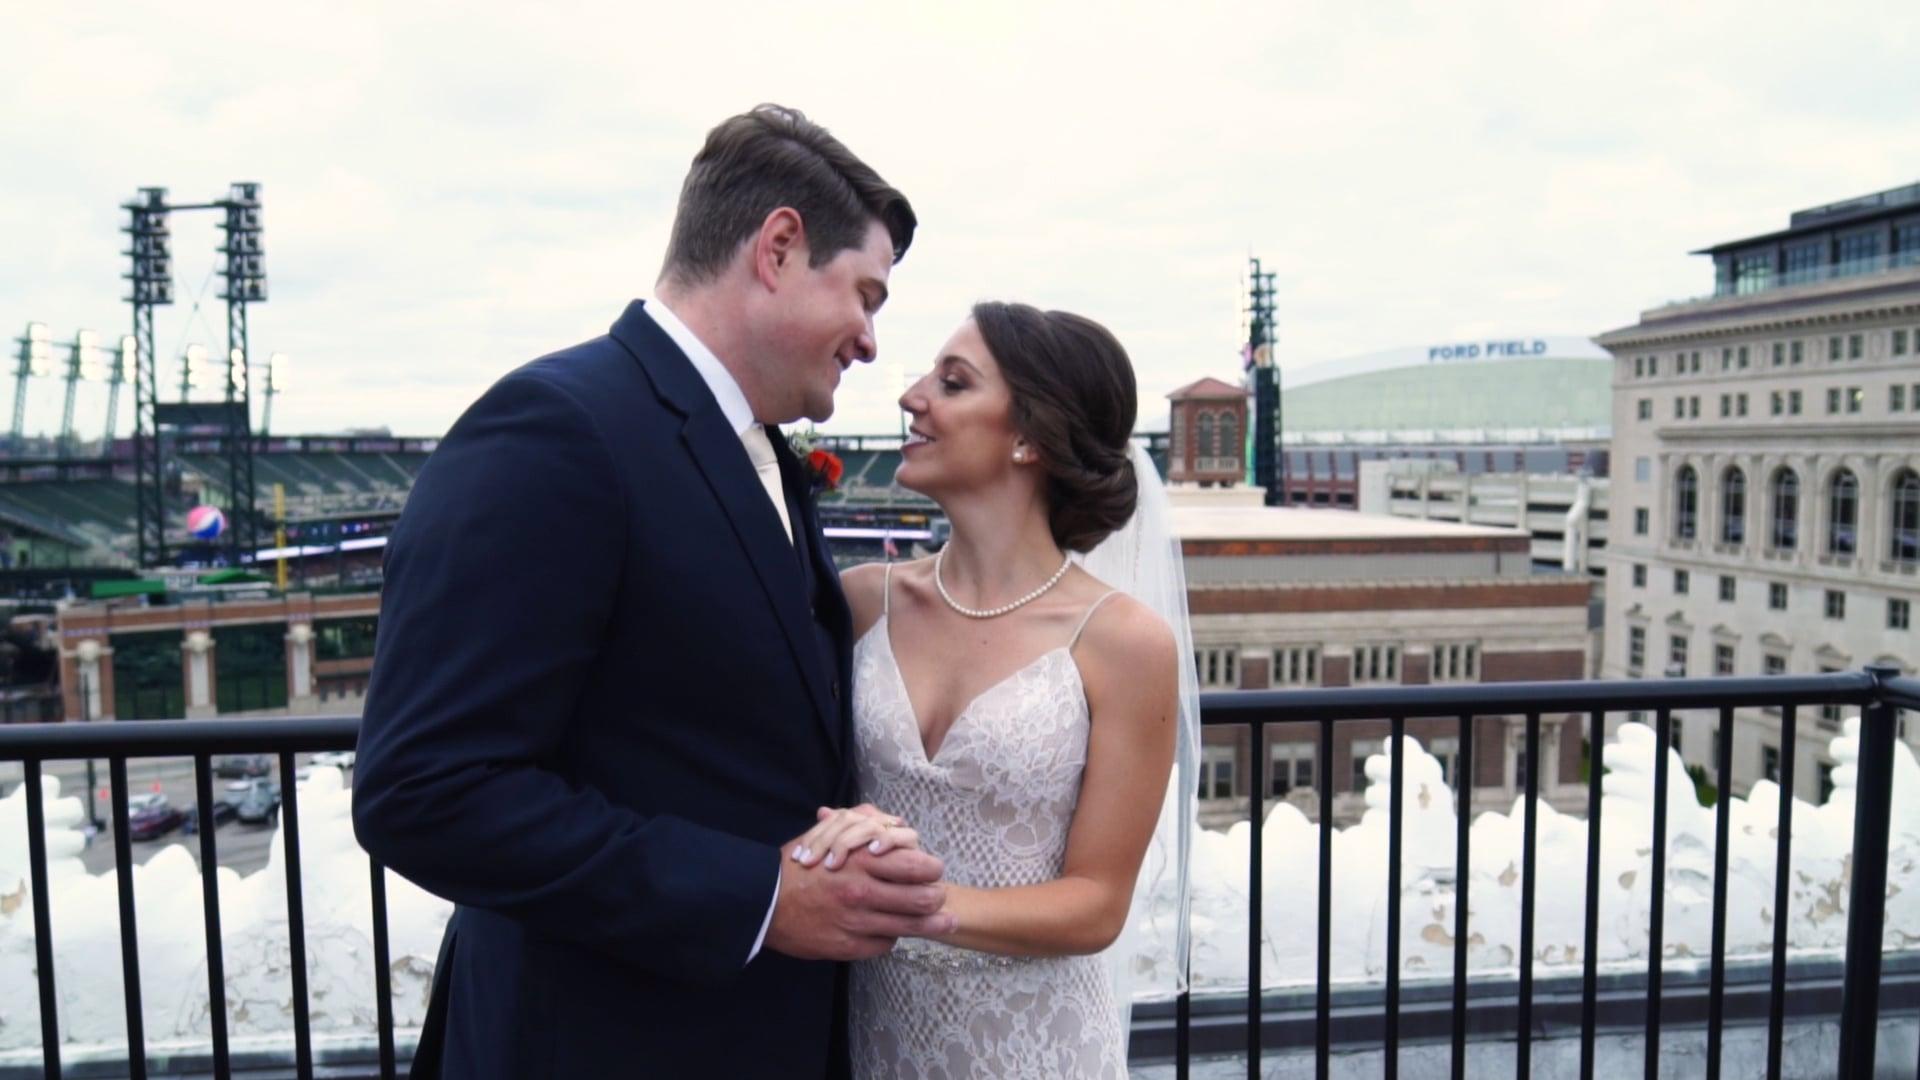 Detroit Opera House Wedding | Katie + John Trailer